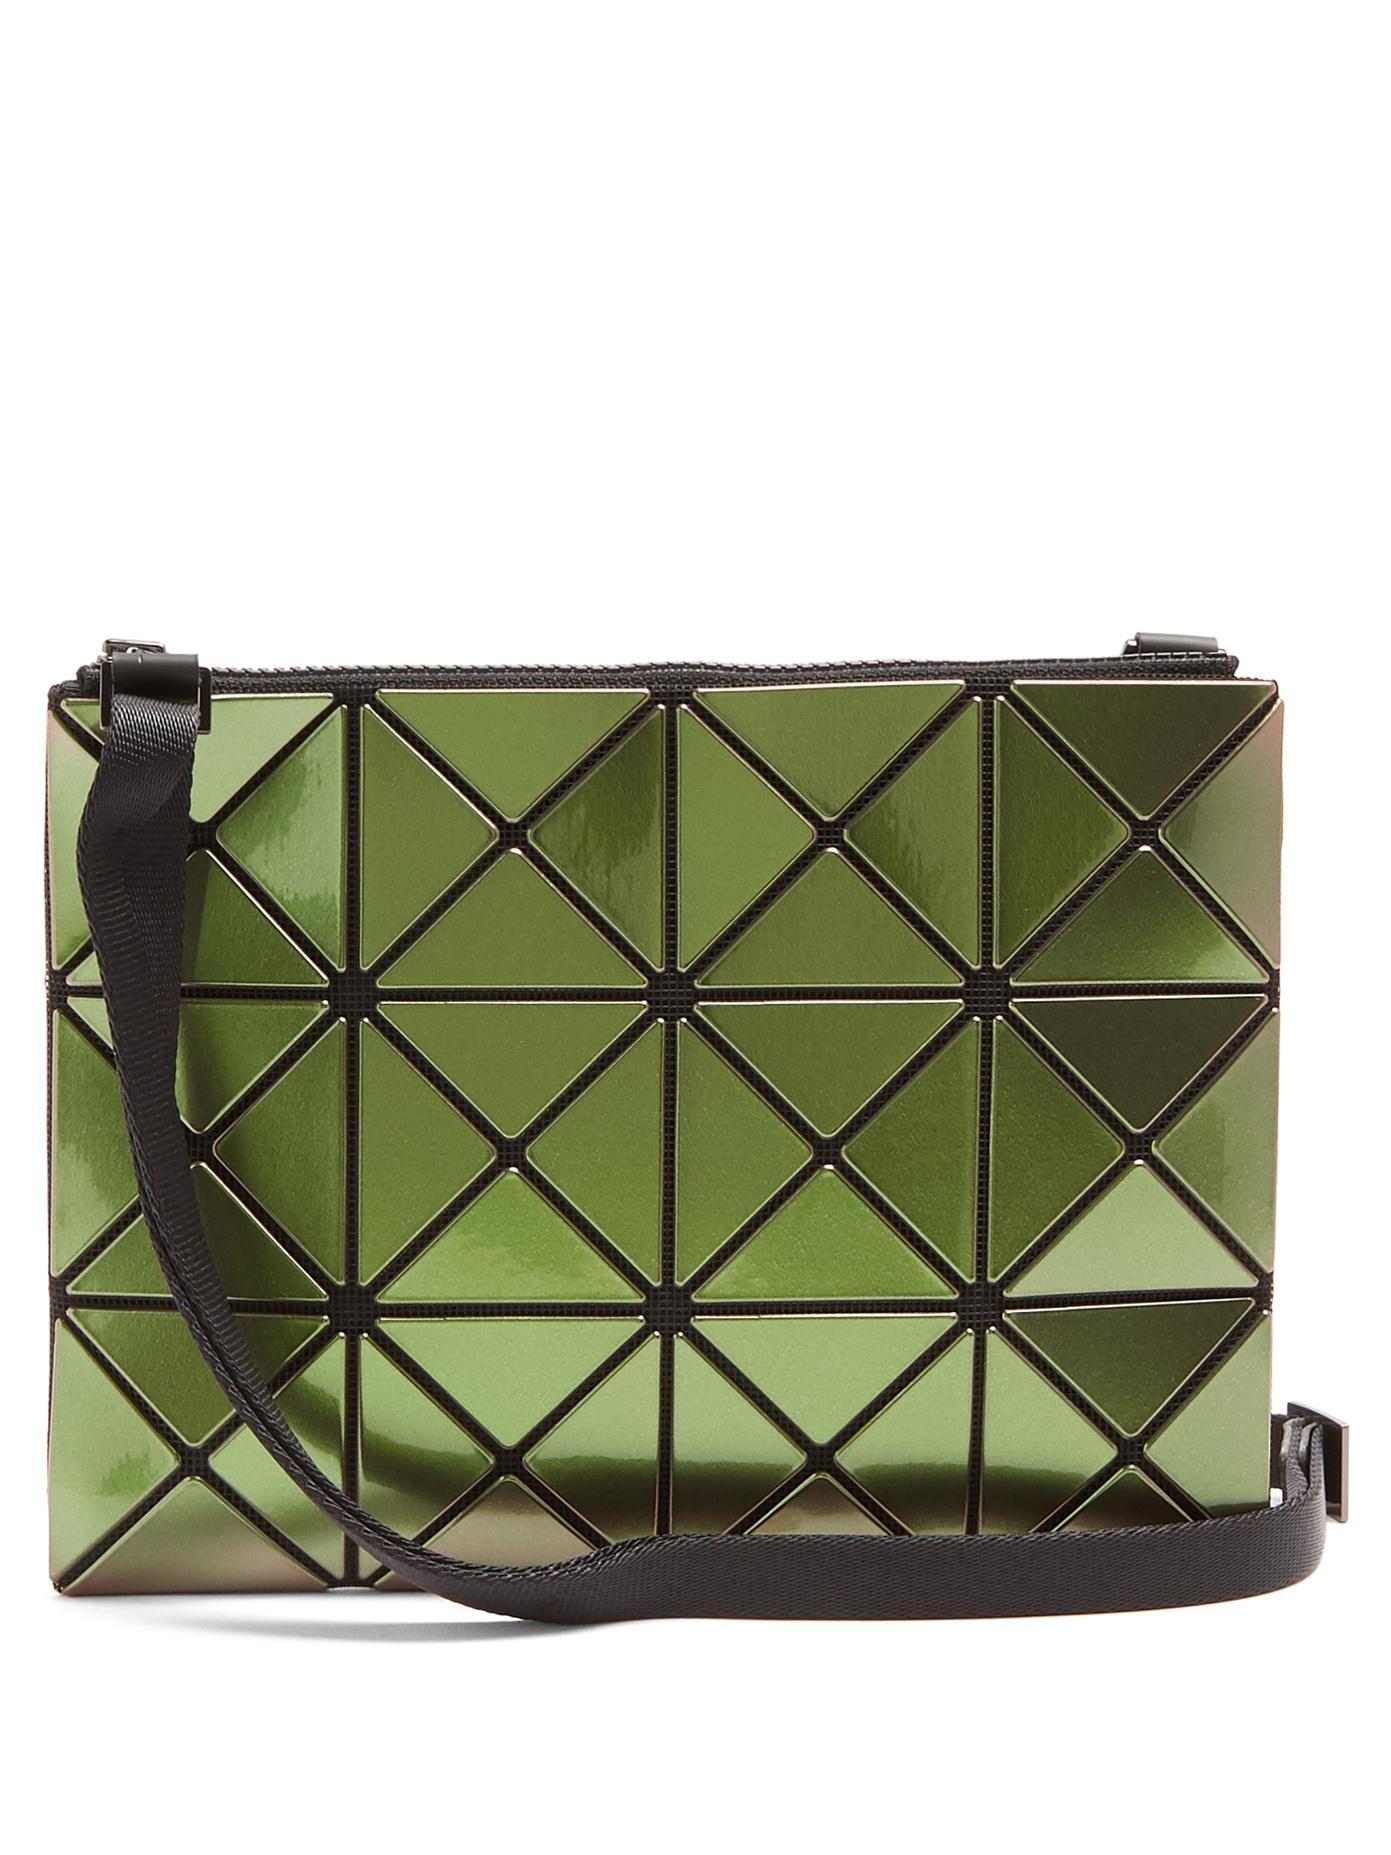 01c4accf17 Bao Bao Issey Miyake Lucent Gloss Cross-Body Bag In Green   ModeSens